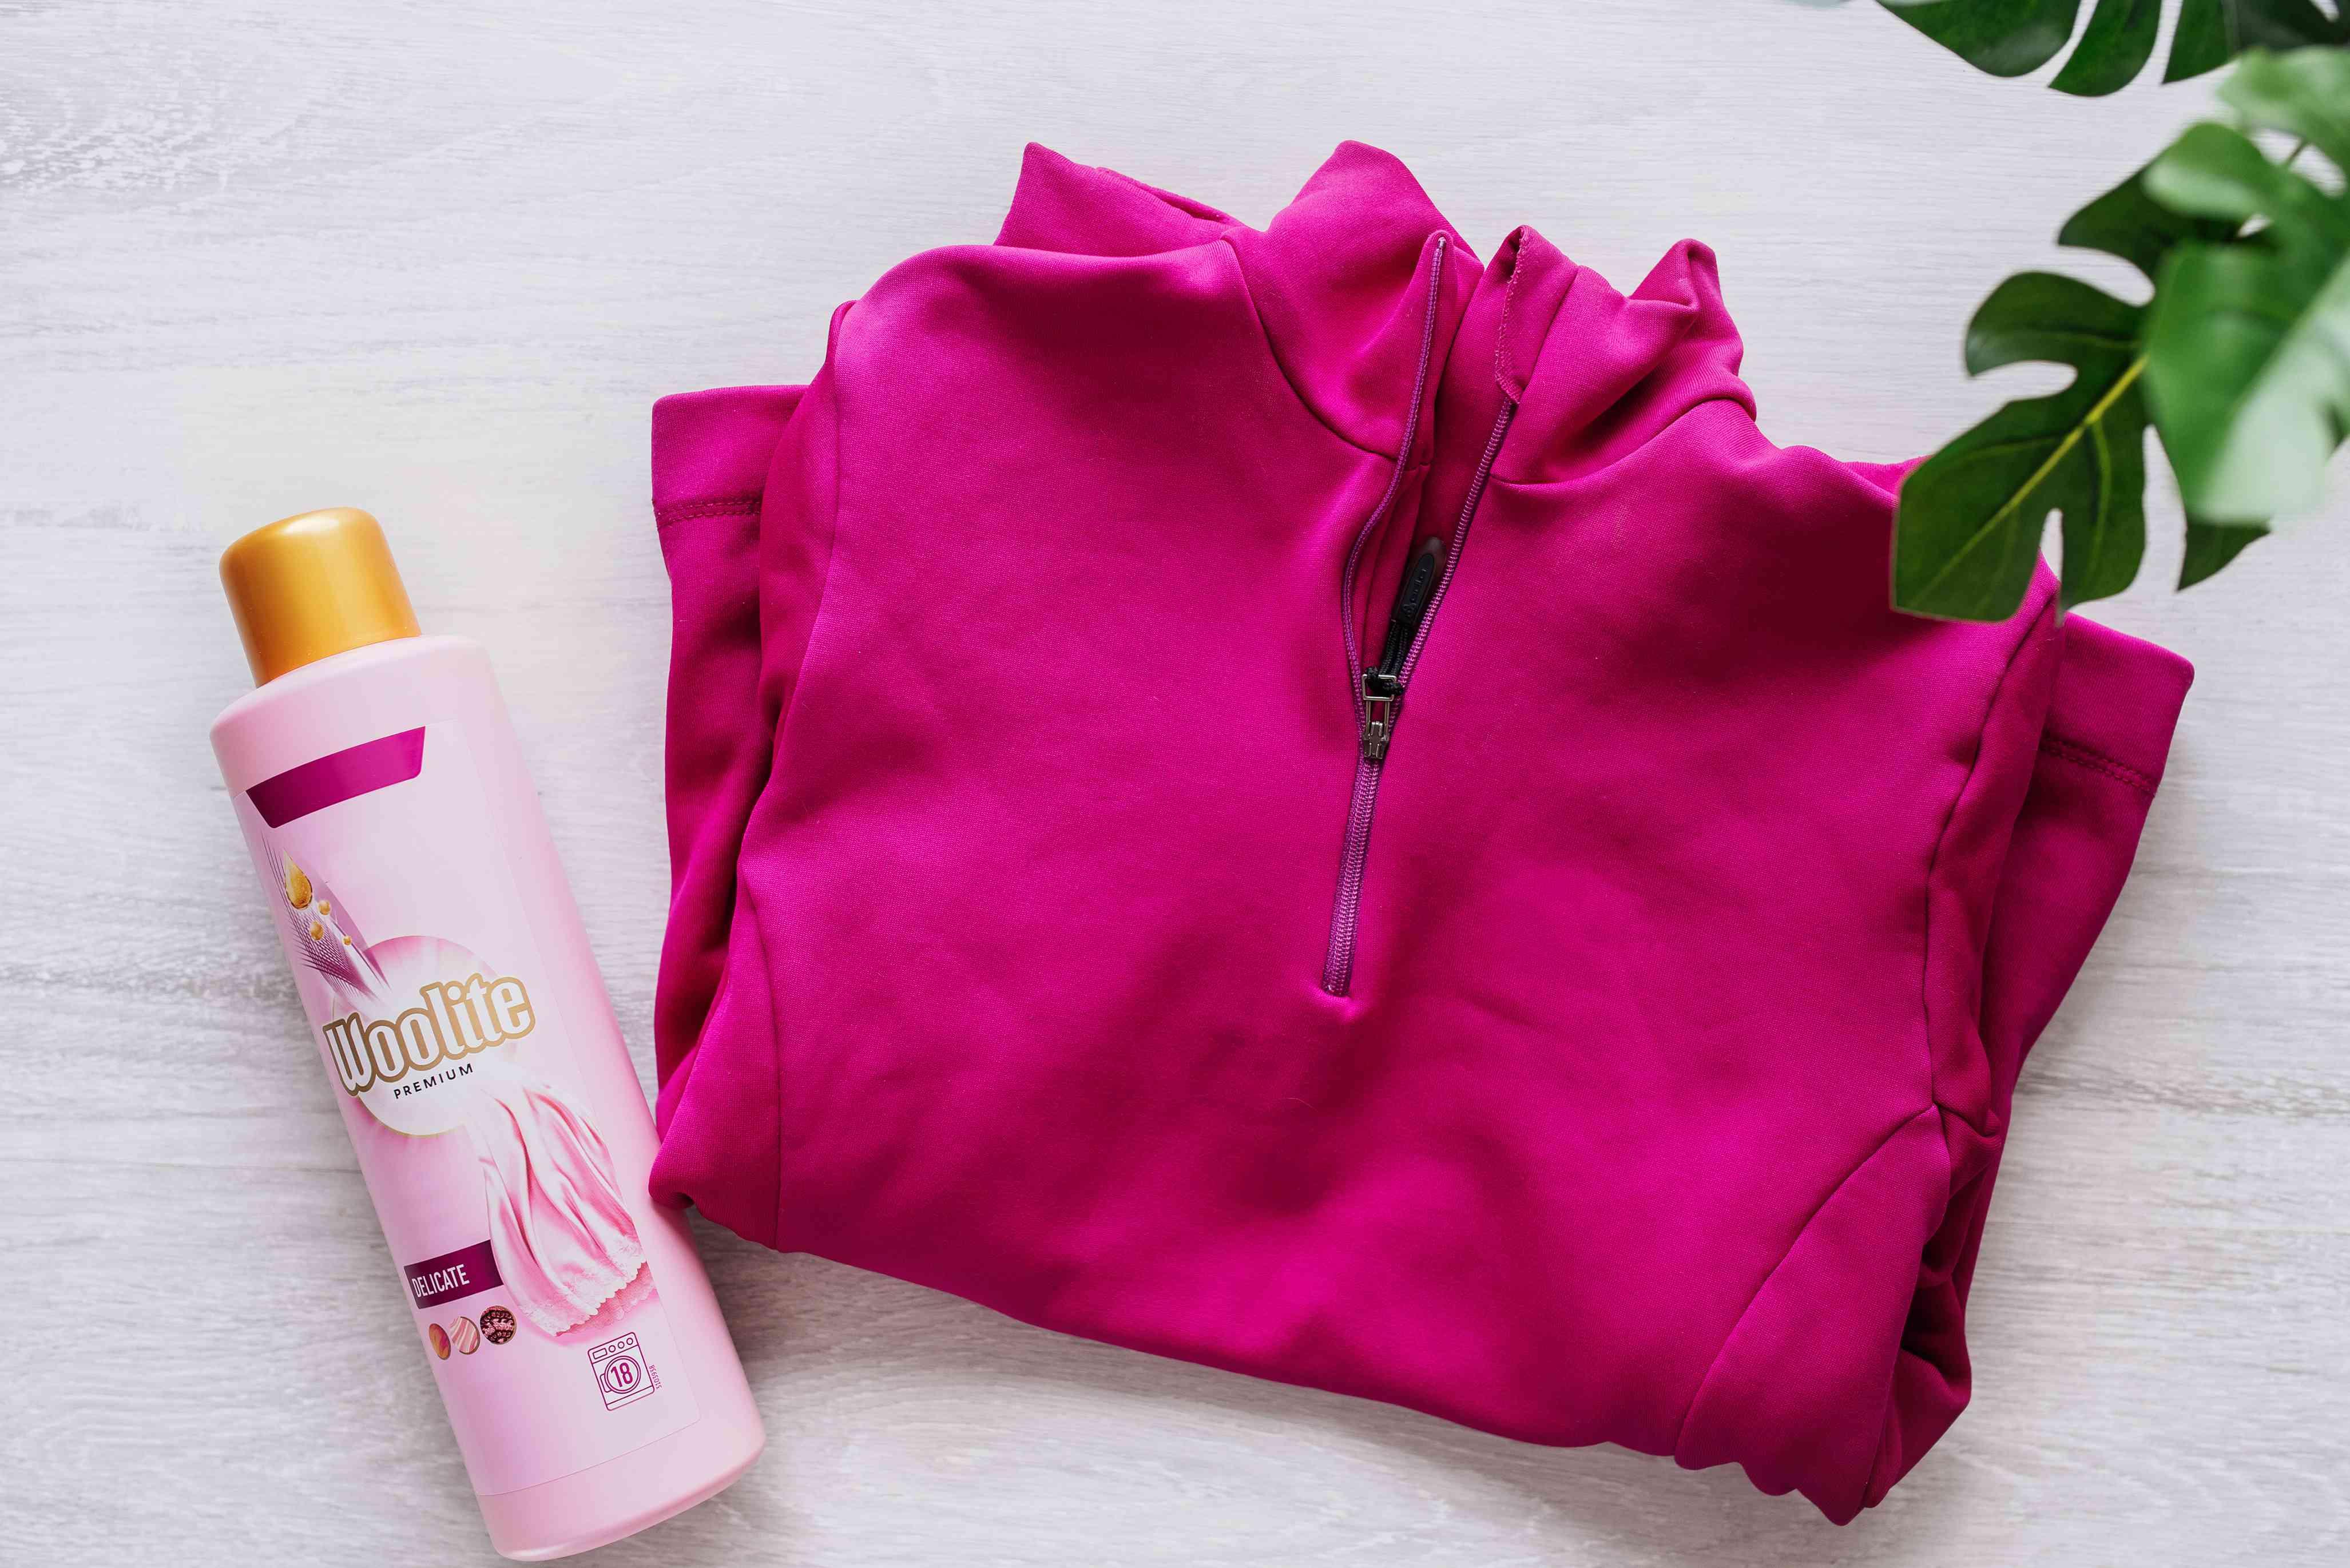 Pink fleece jacket folded next to pink bottle of Woolite mild detergent